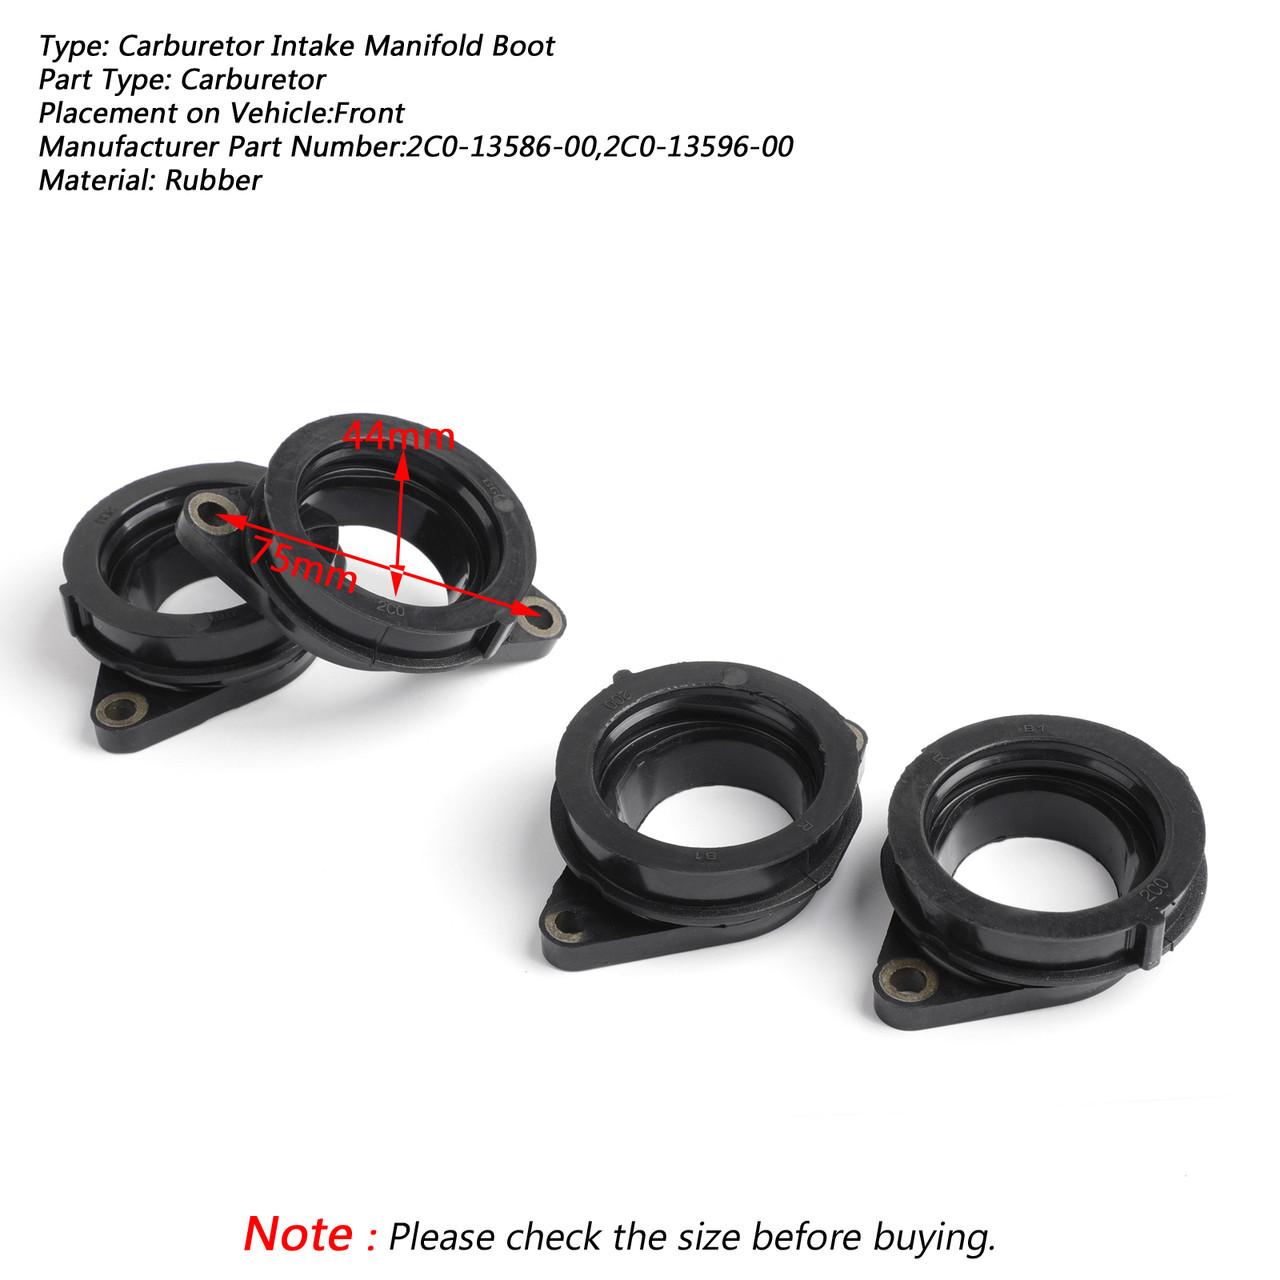 Intake Manifold Boot for Yamaha YZF600R FZR600